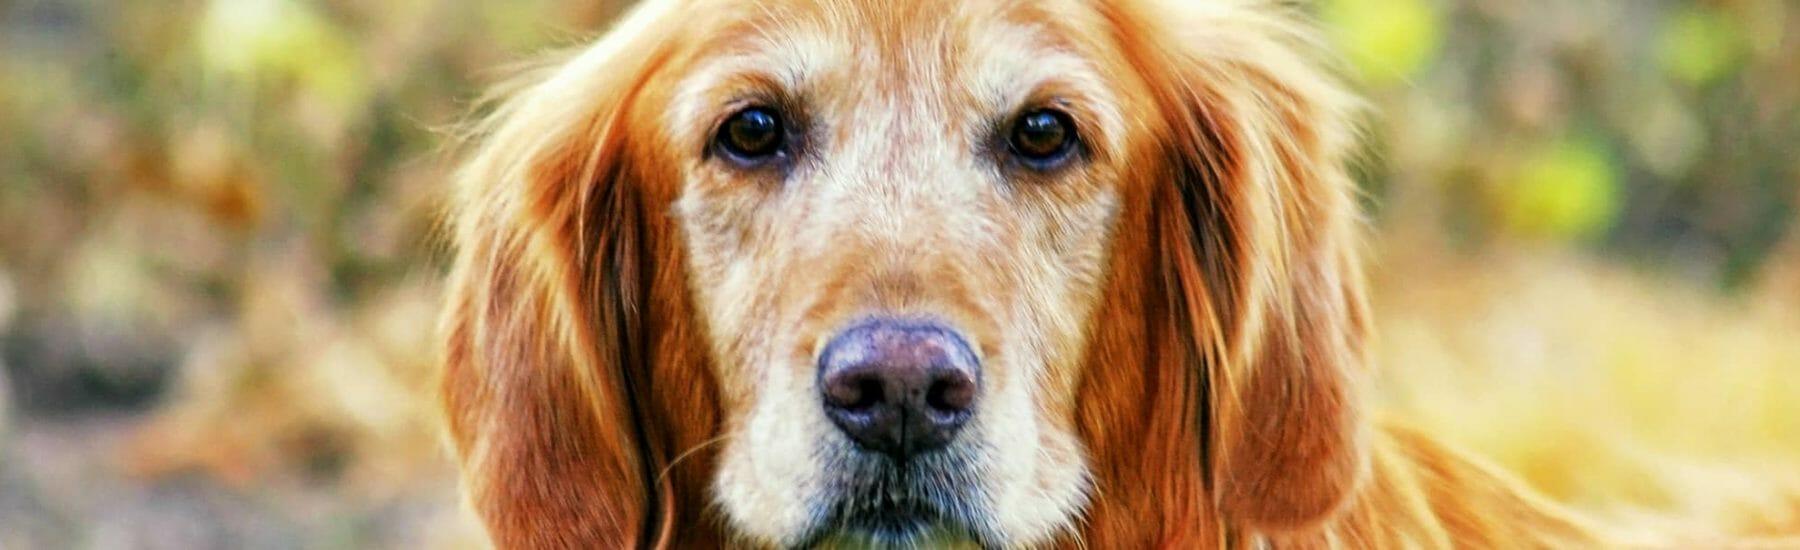 Senior Care for Pets